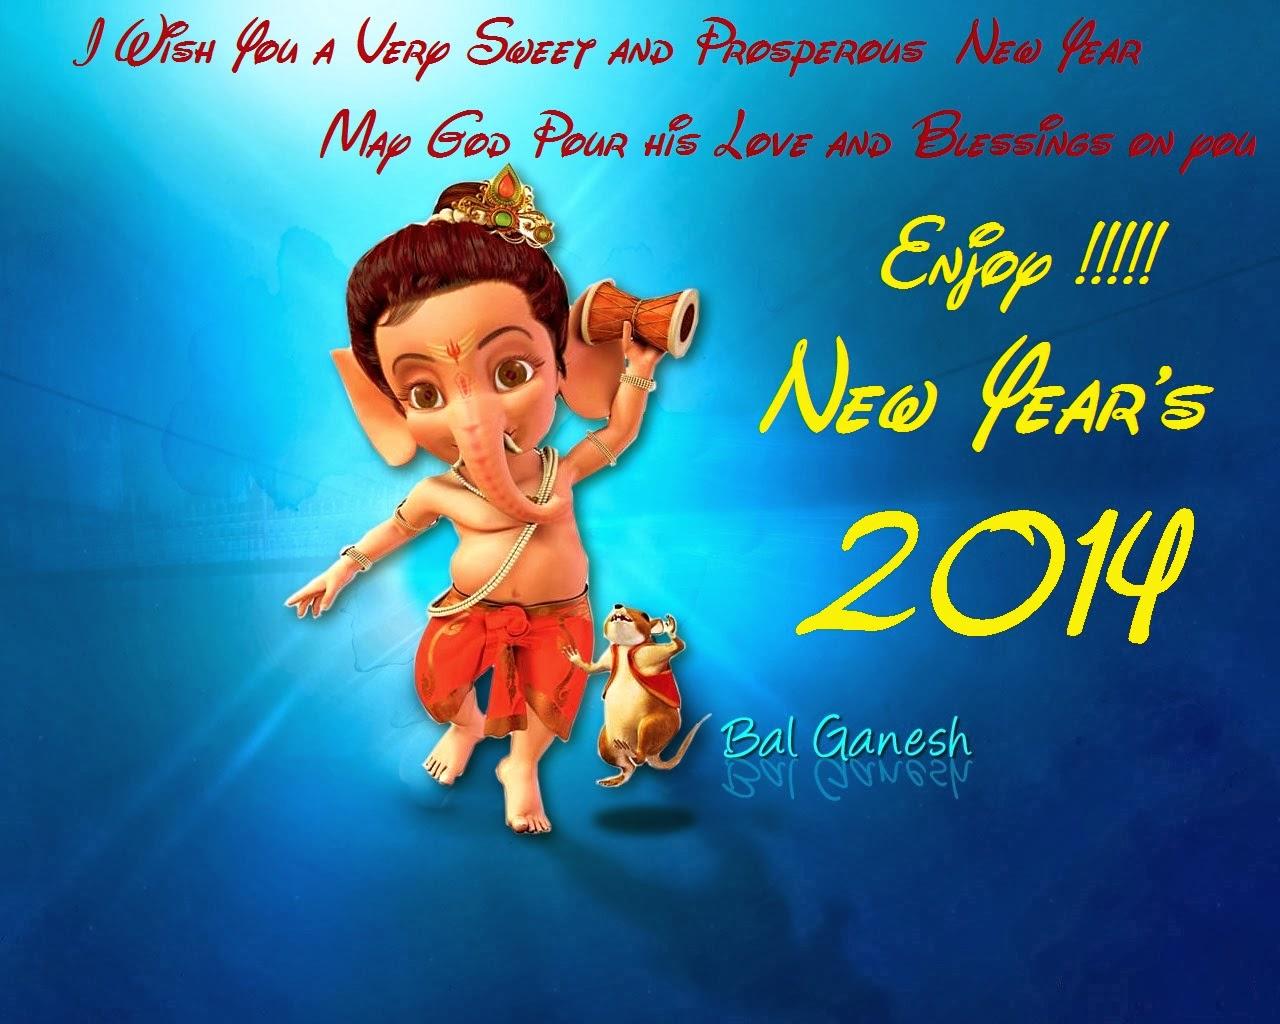 Khushi For Life Ganesha New Year 2014 Cards Bal Ganesh Greetings